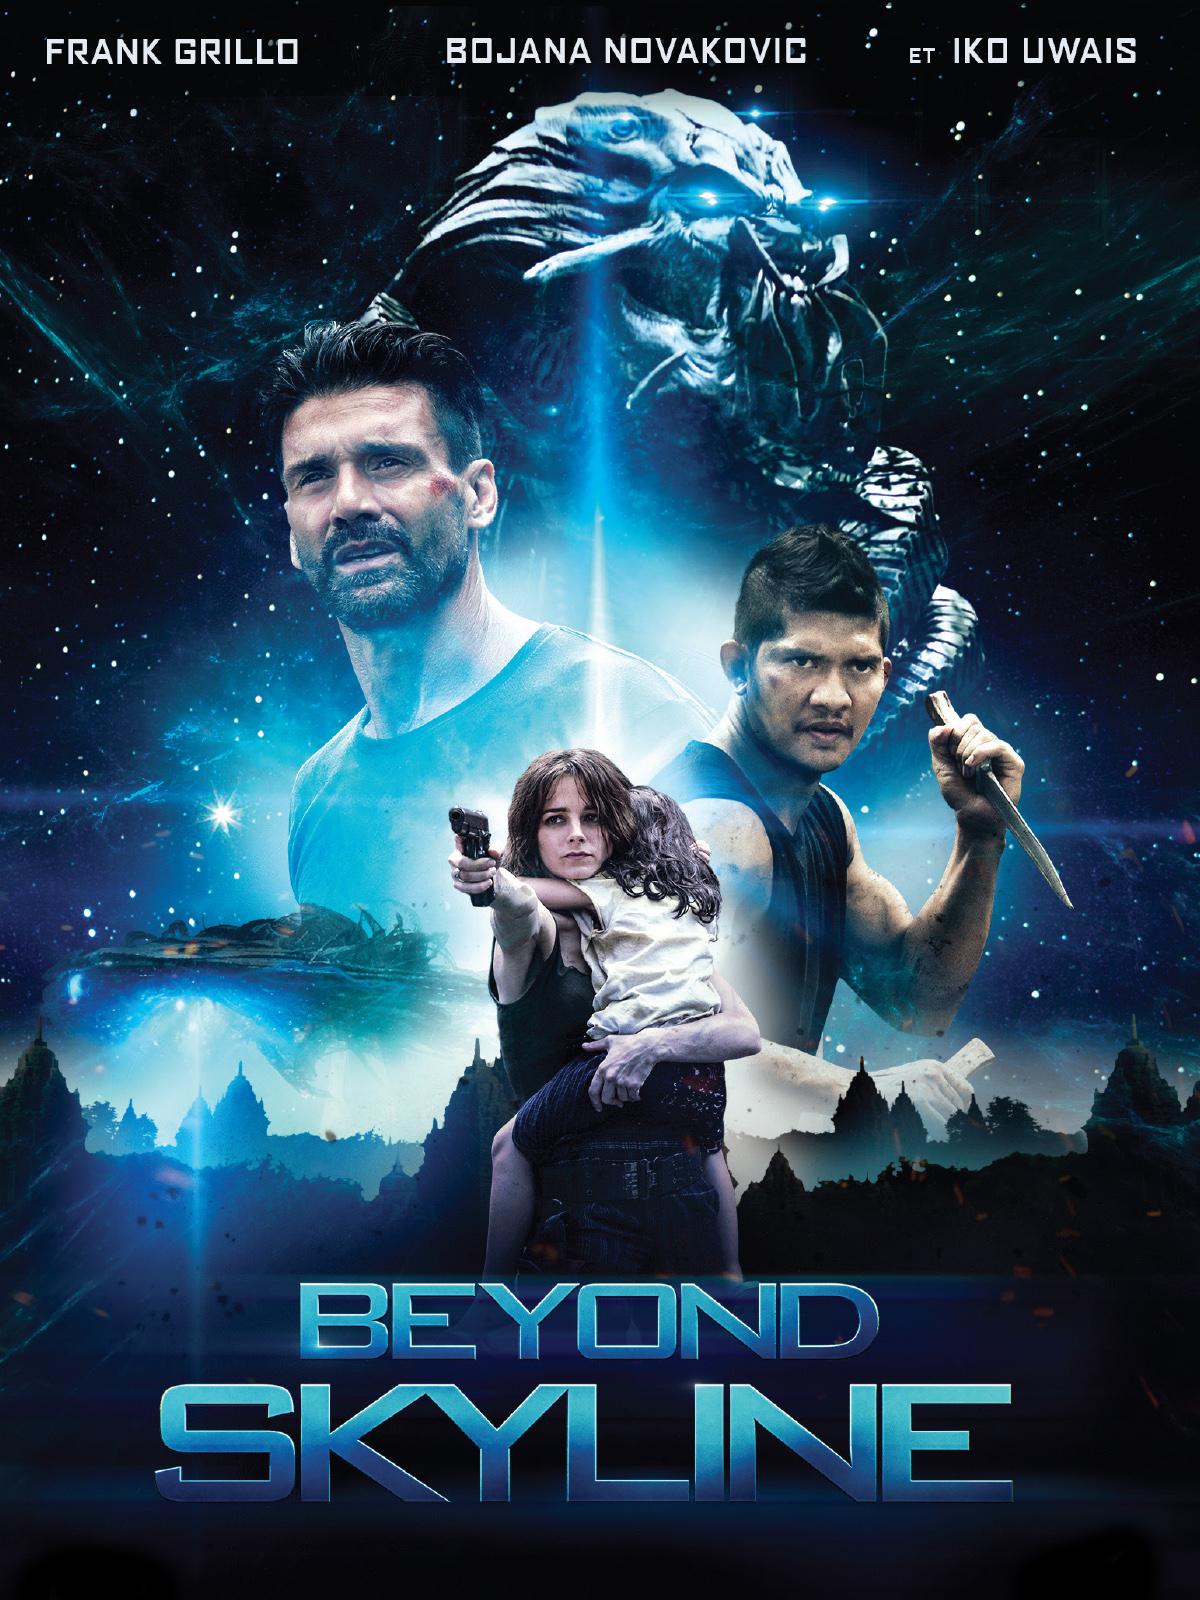 Skyline Film Teil 2